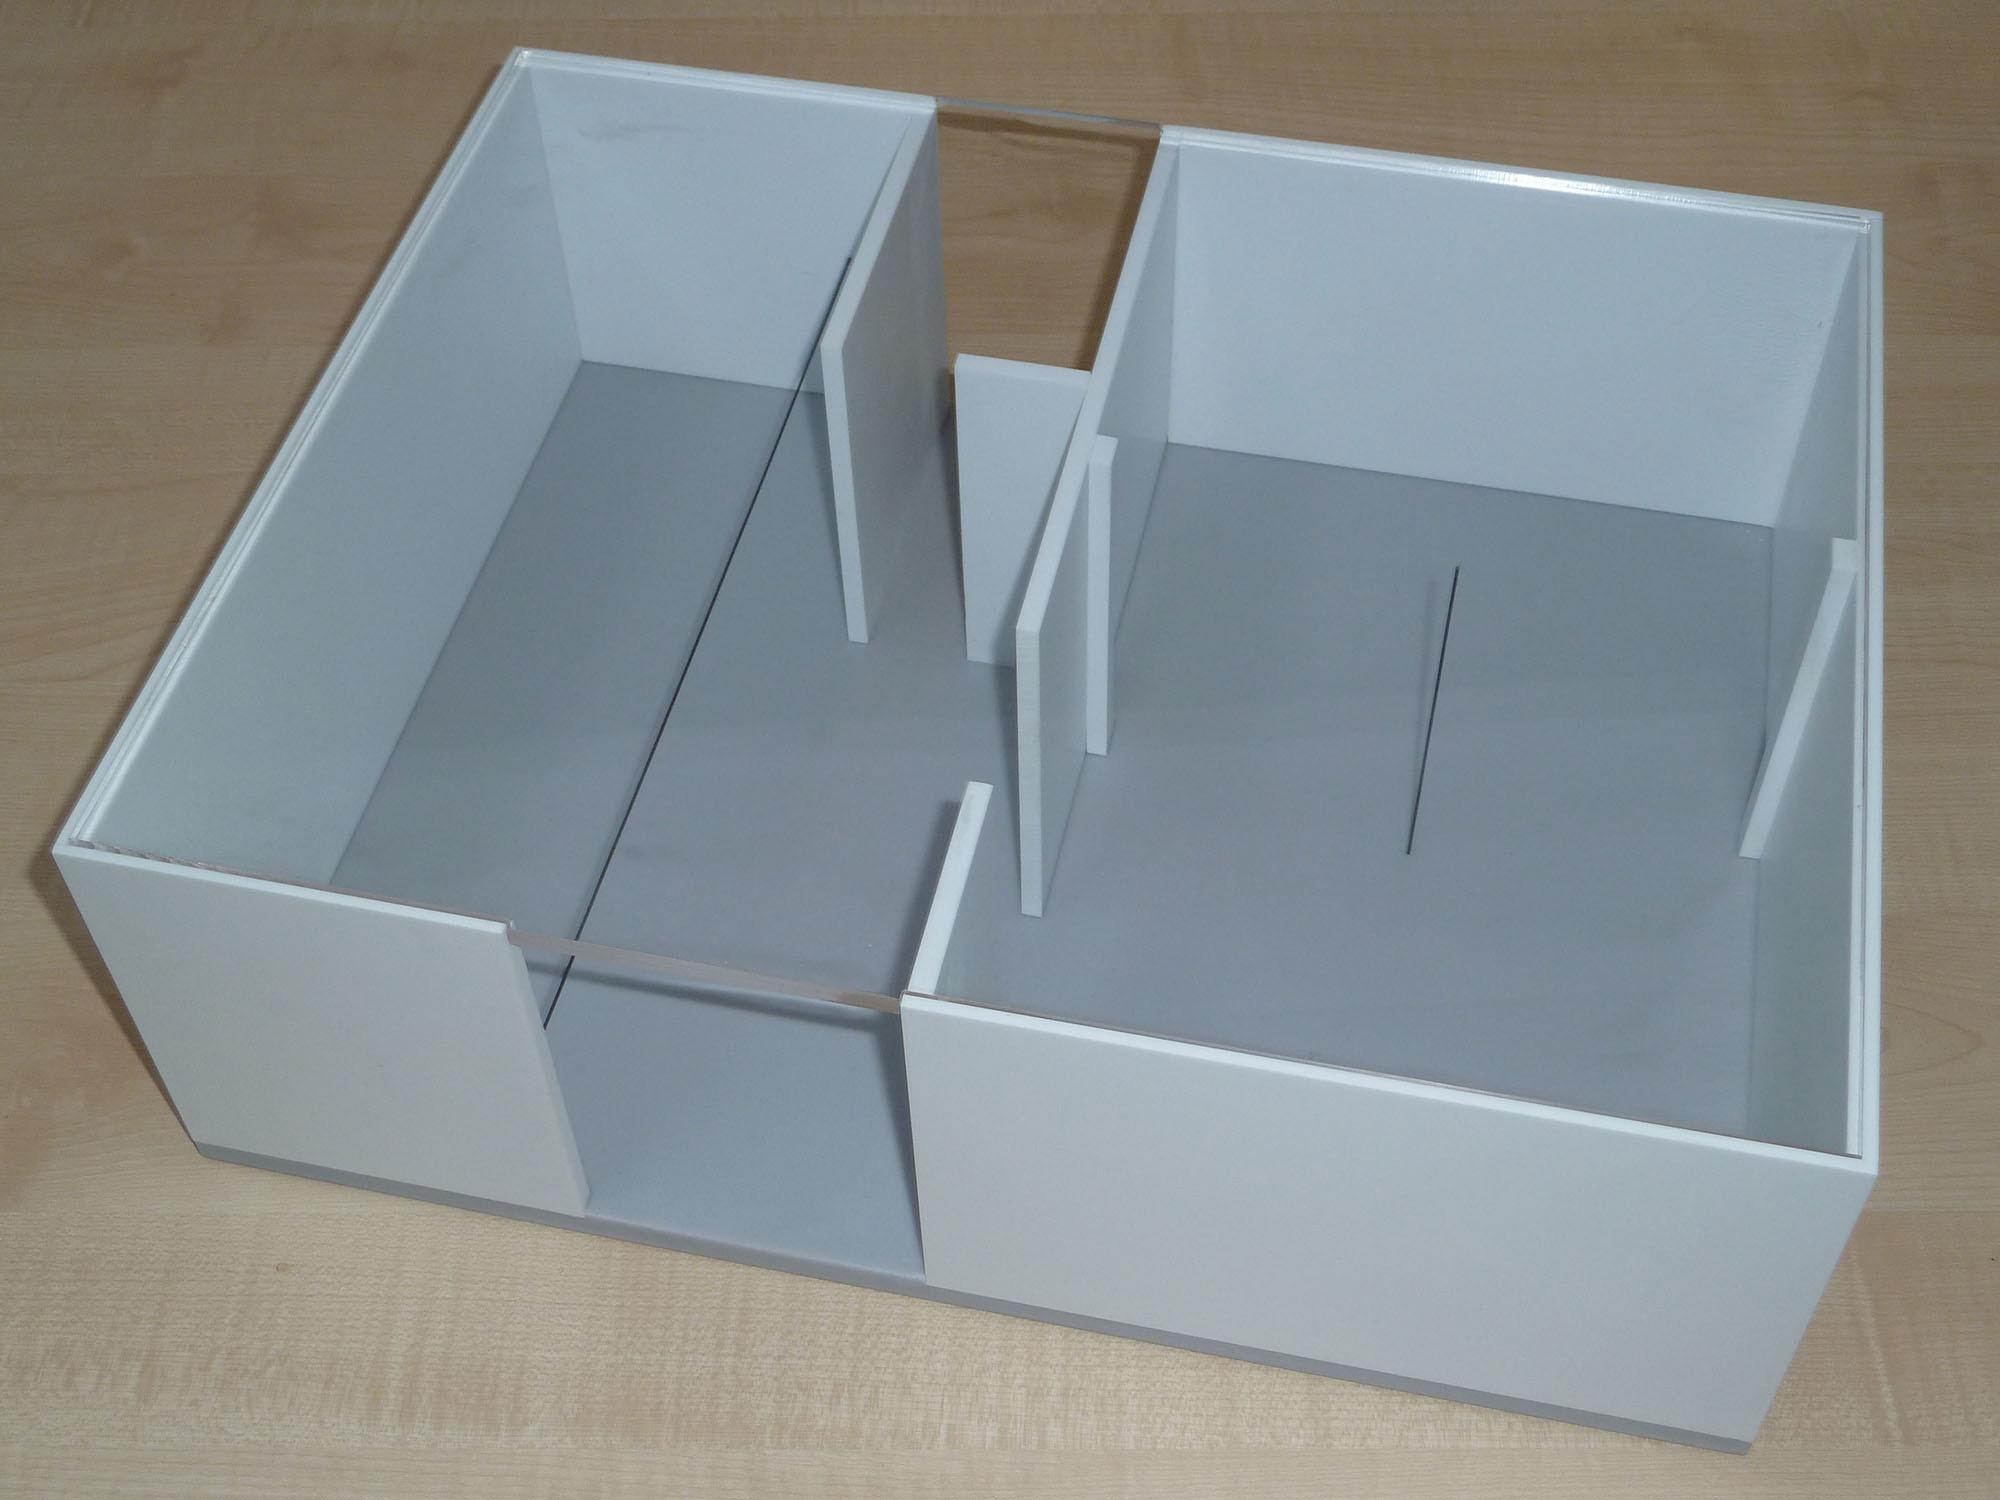 Small-P1030497-003.jpg